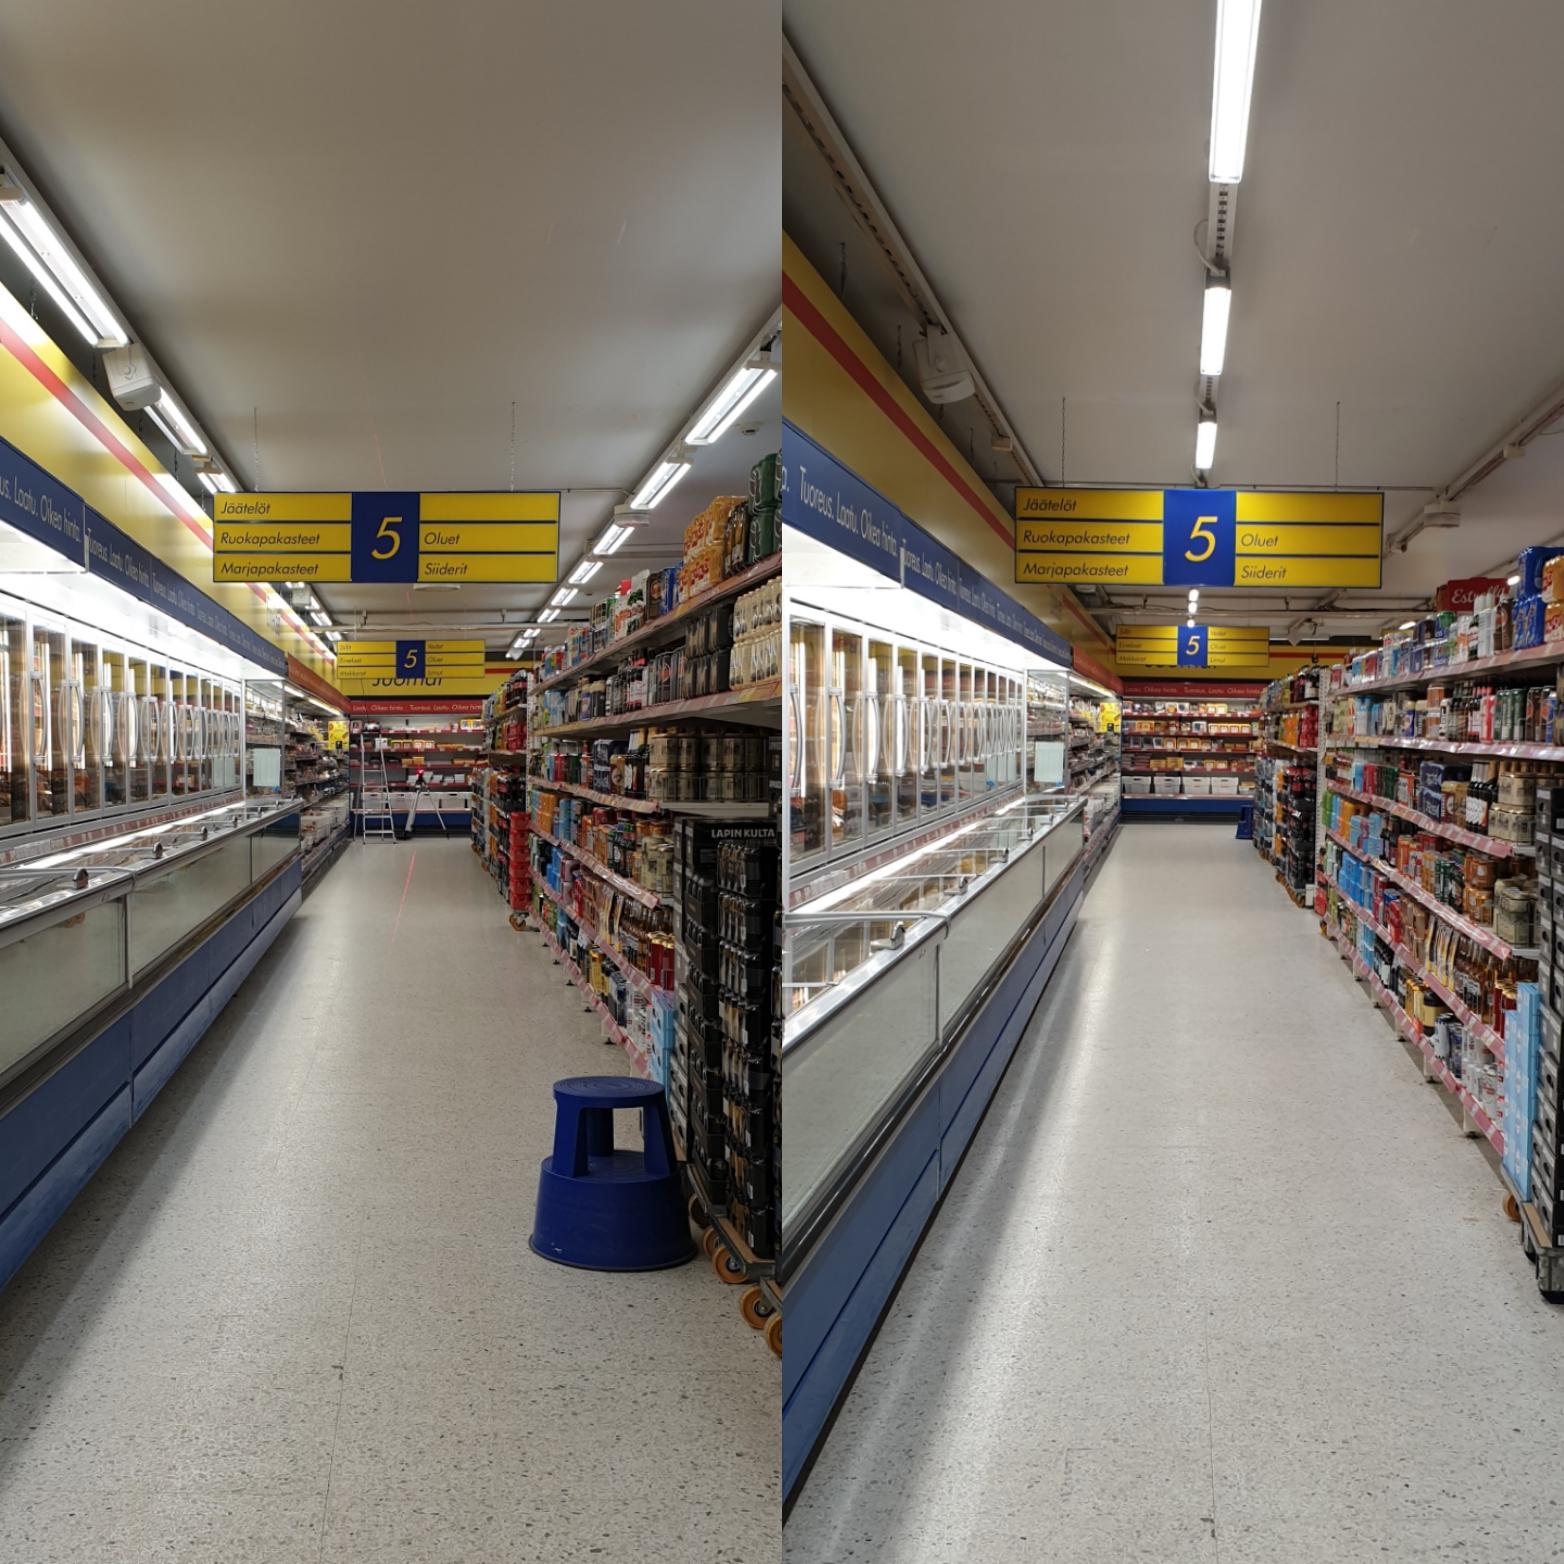 Uudet LED-valaisimet oikealla.